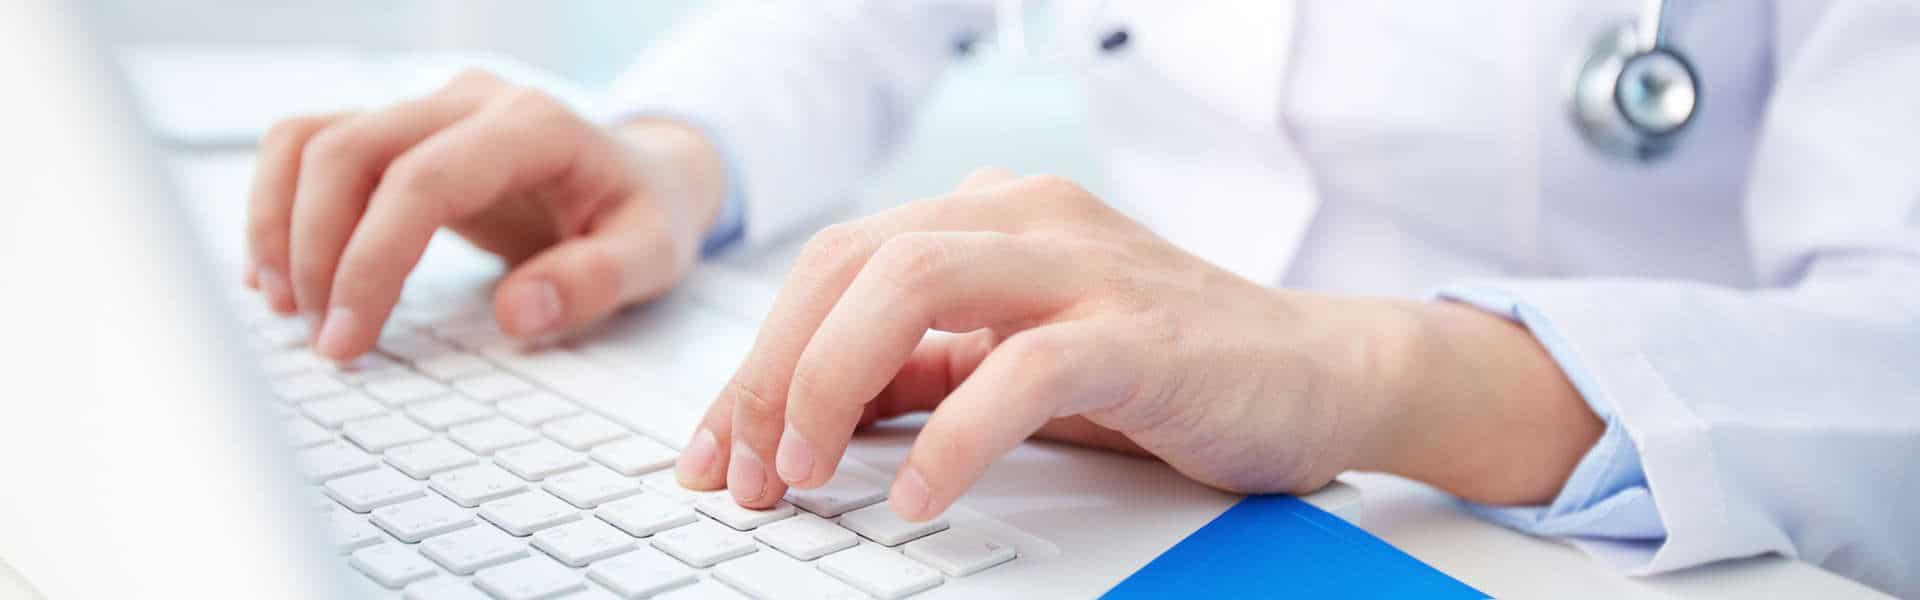 Become a health writer